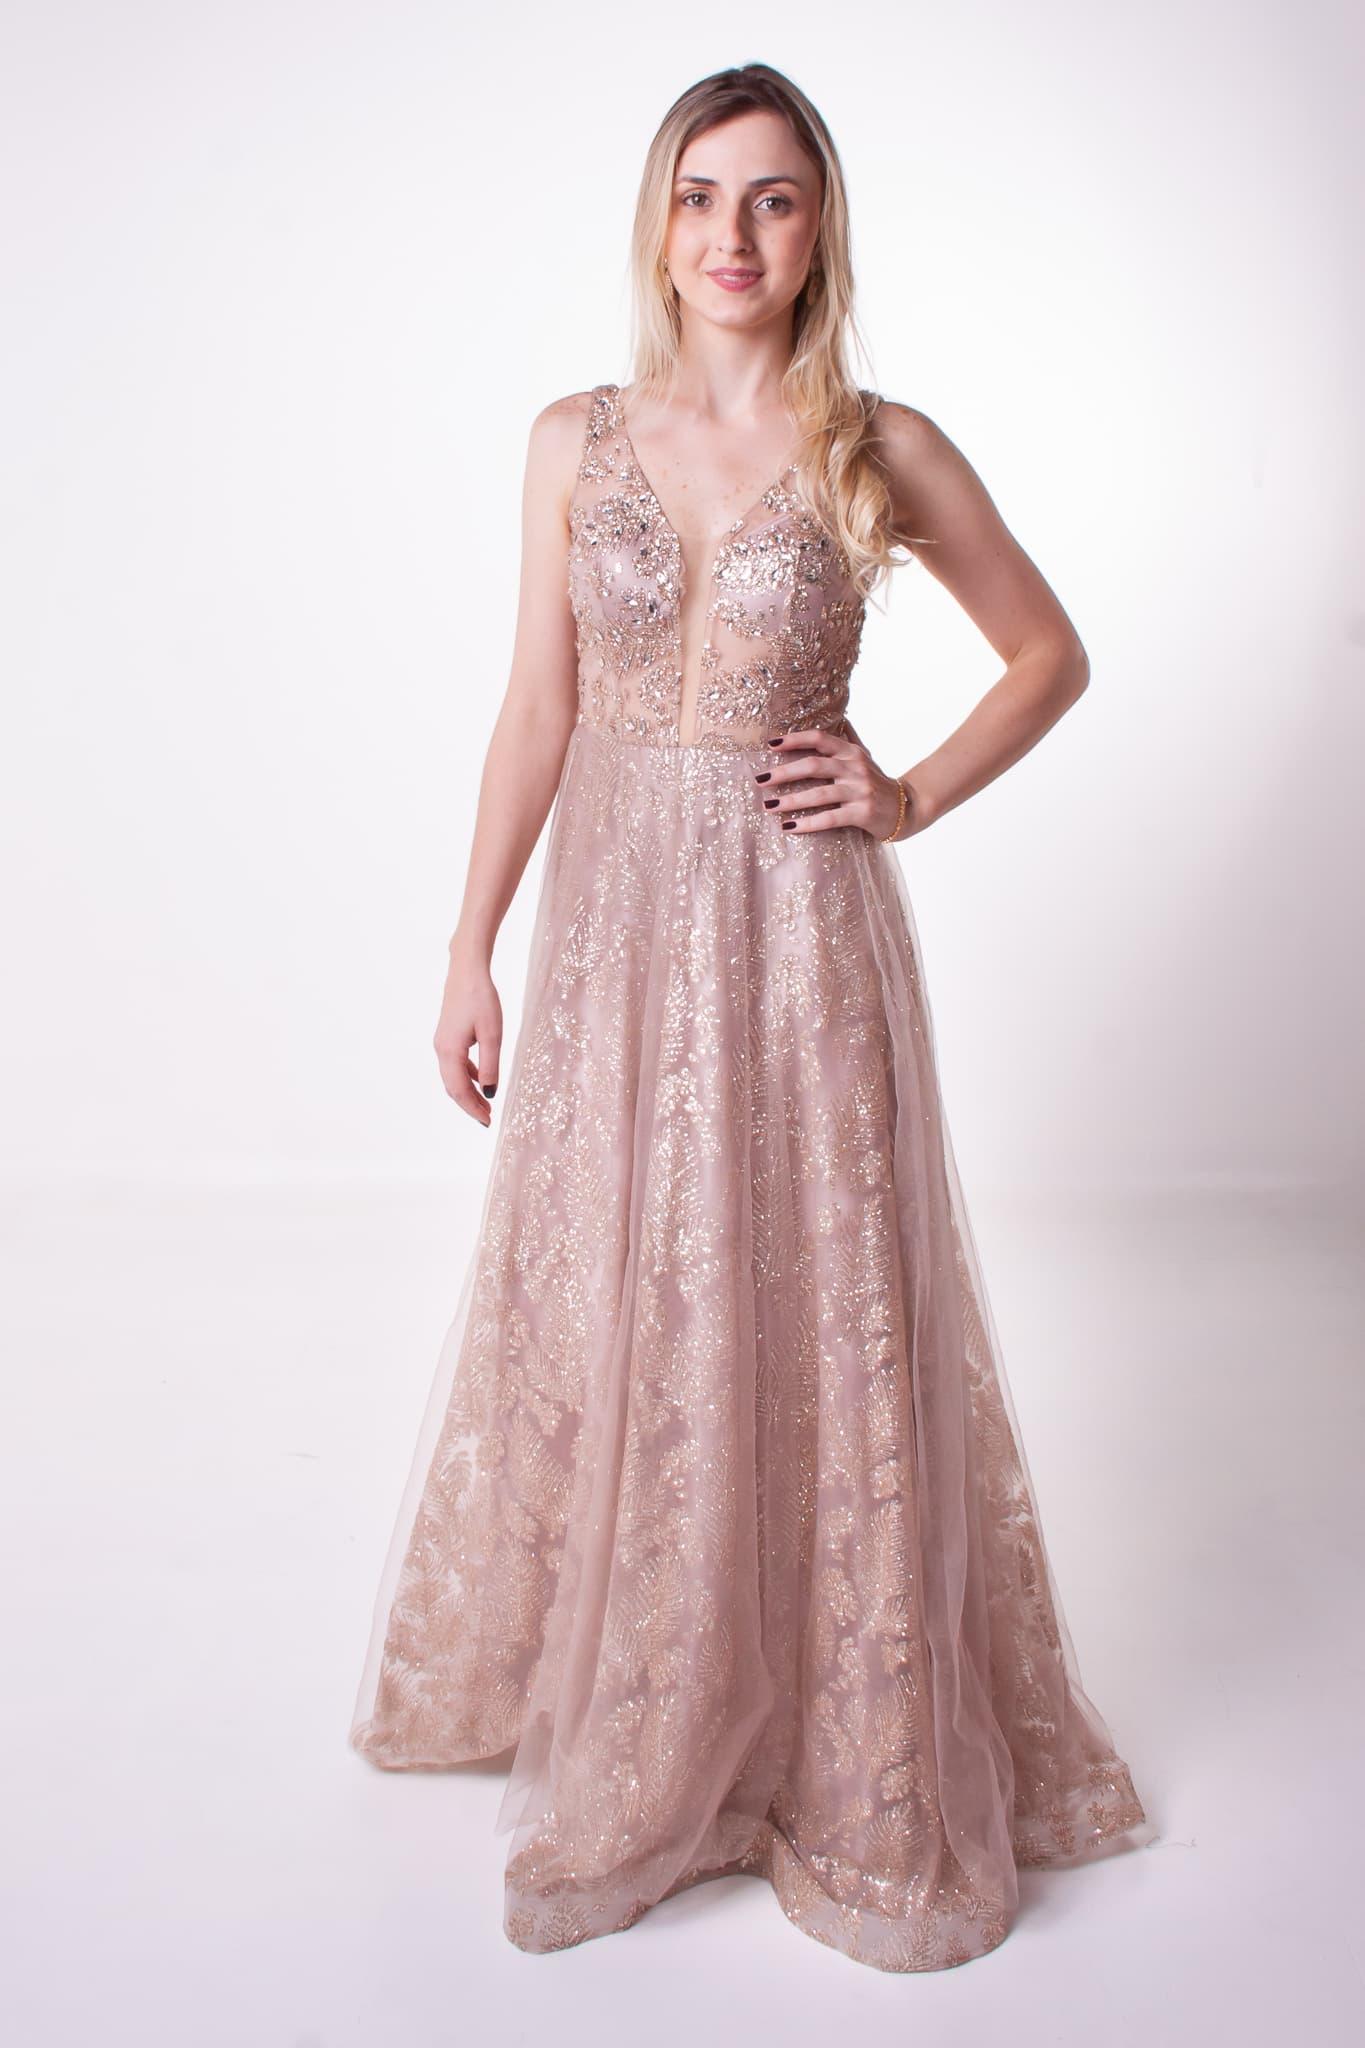 8 - Vestido rosê nude com brilho